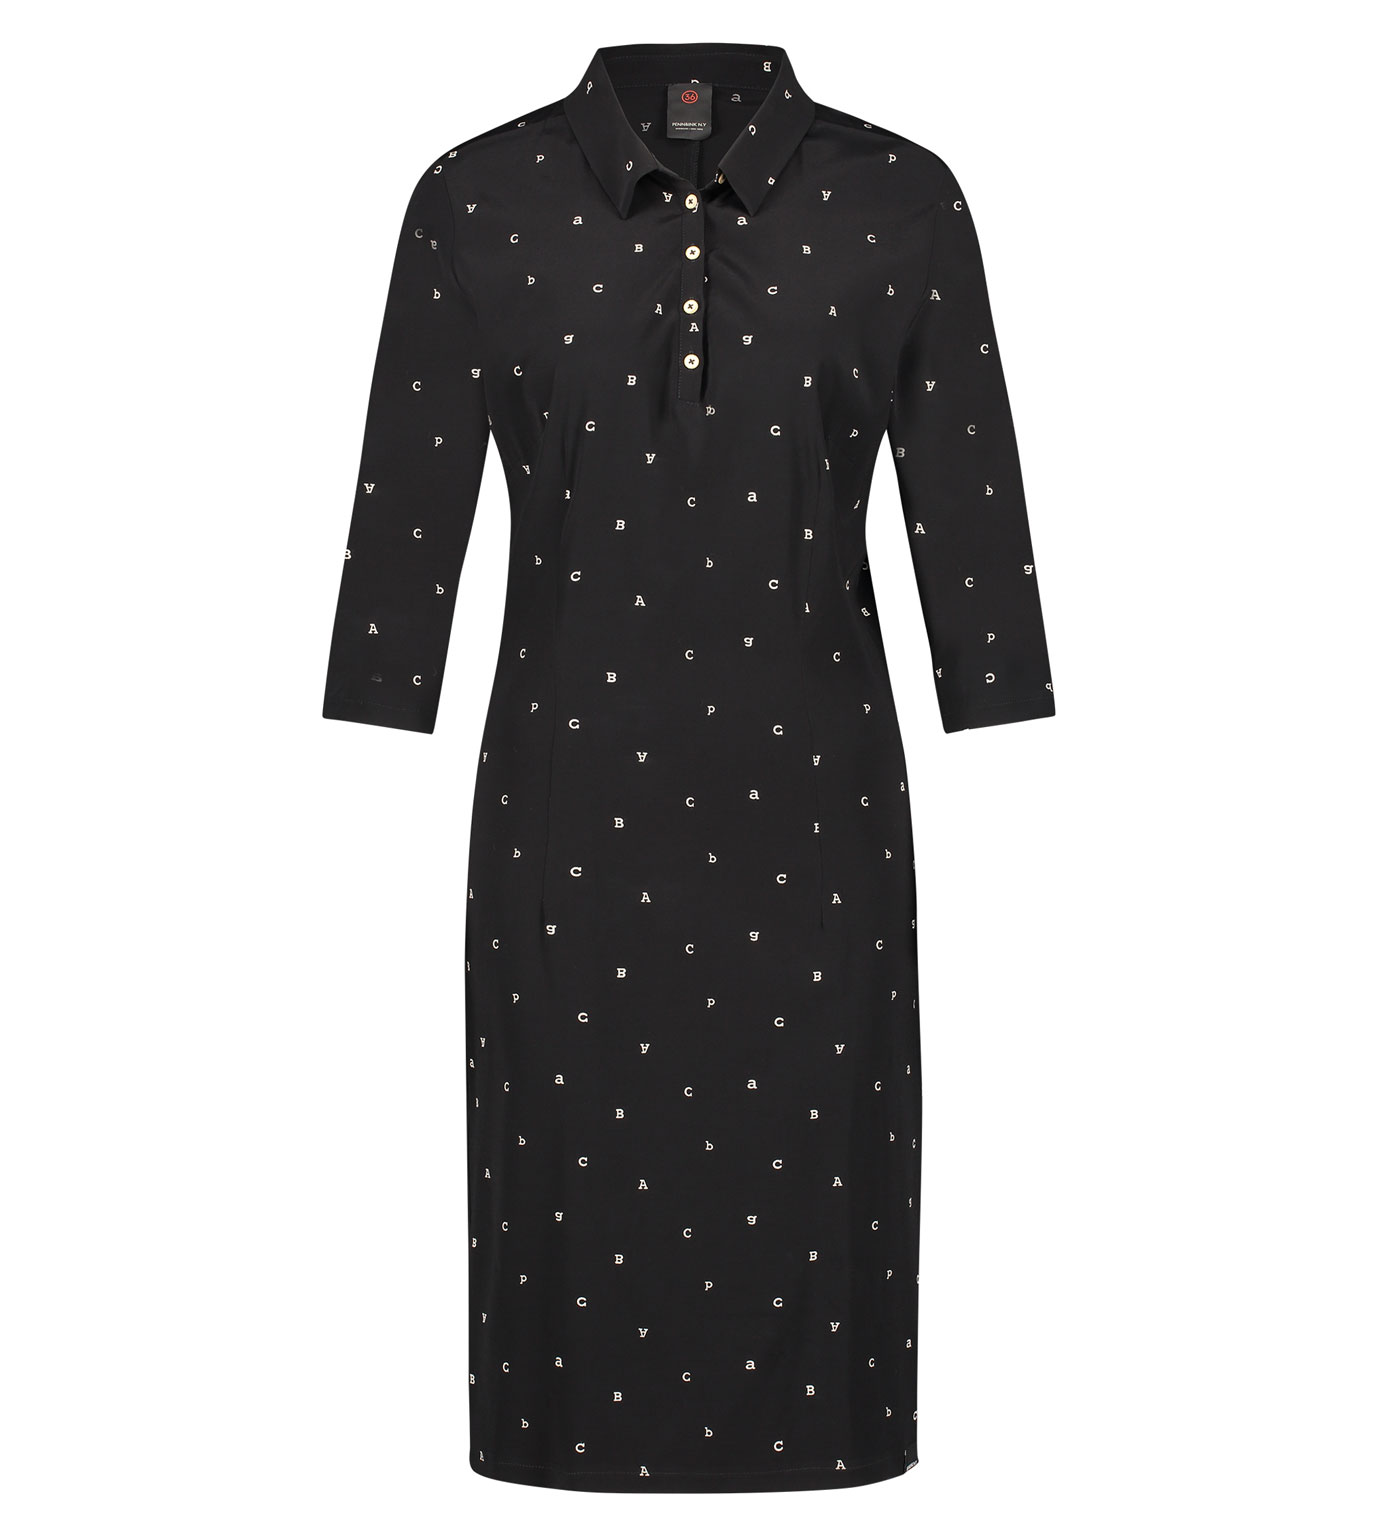 Zwarte dames overhemd jurk Penn & Ink - W19N561